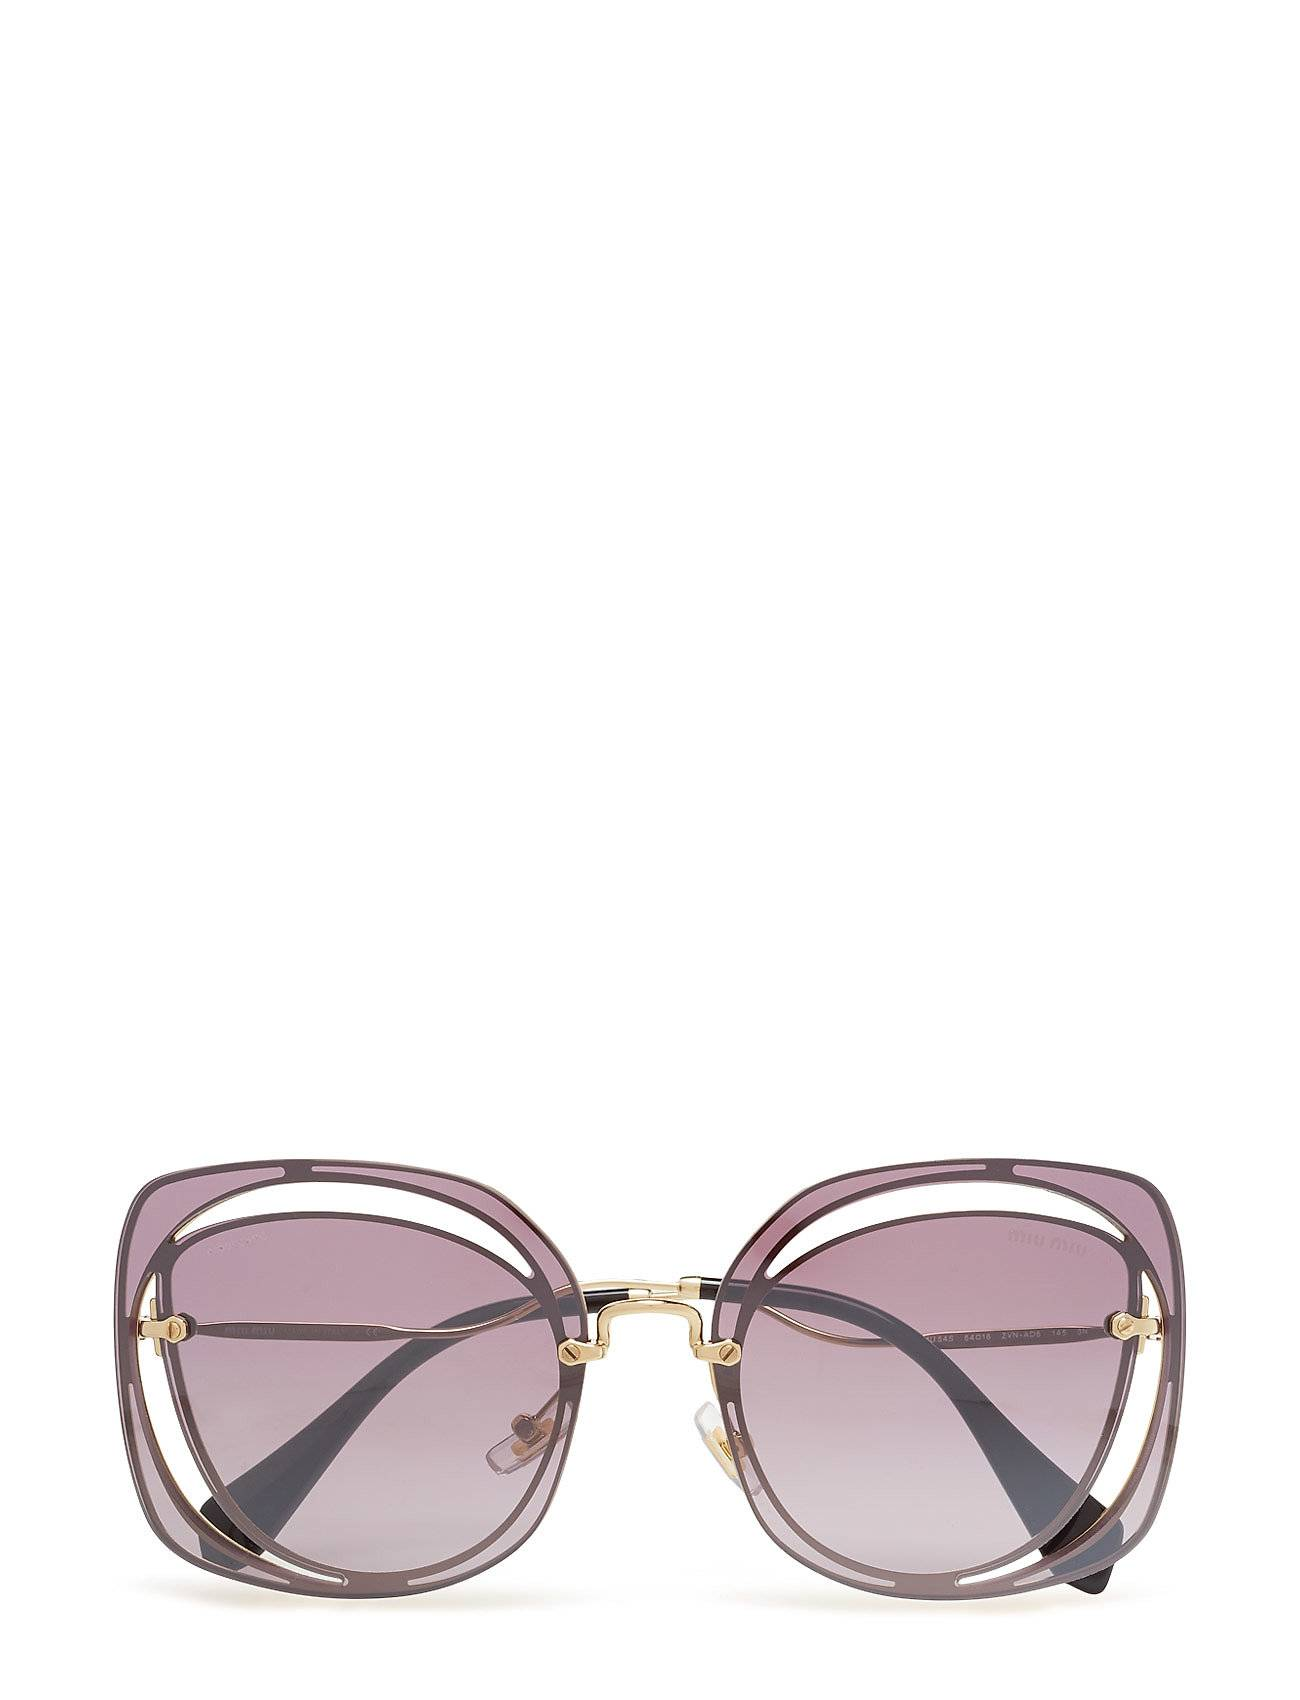 Miu Miu Sunglasses Not Defined